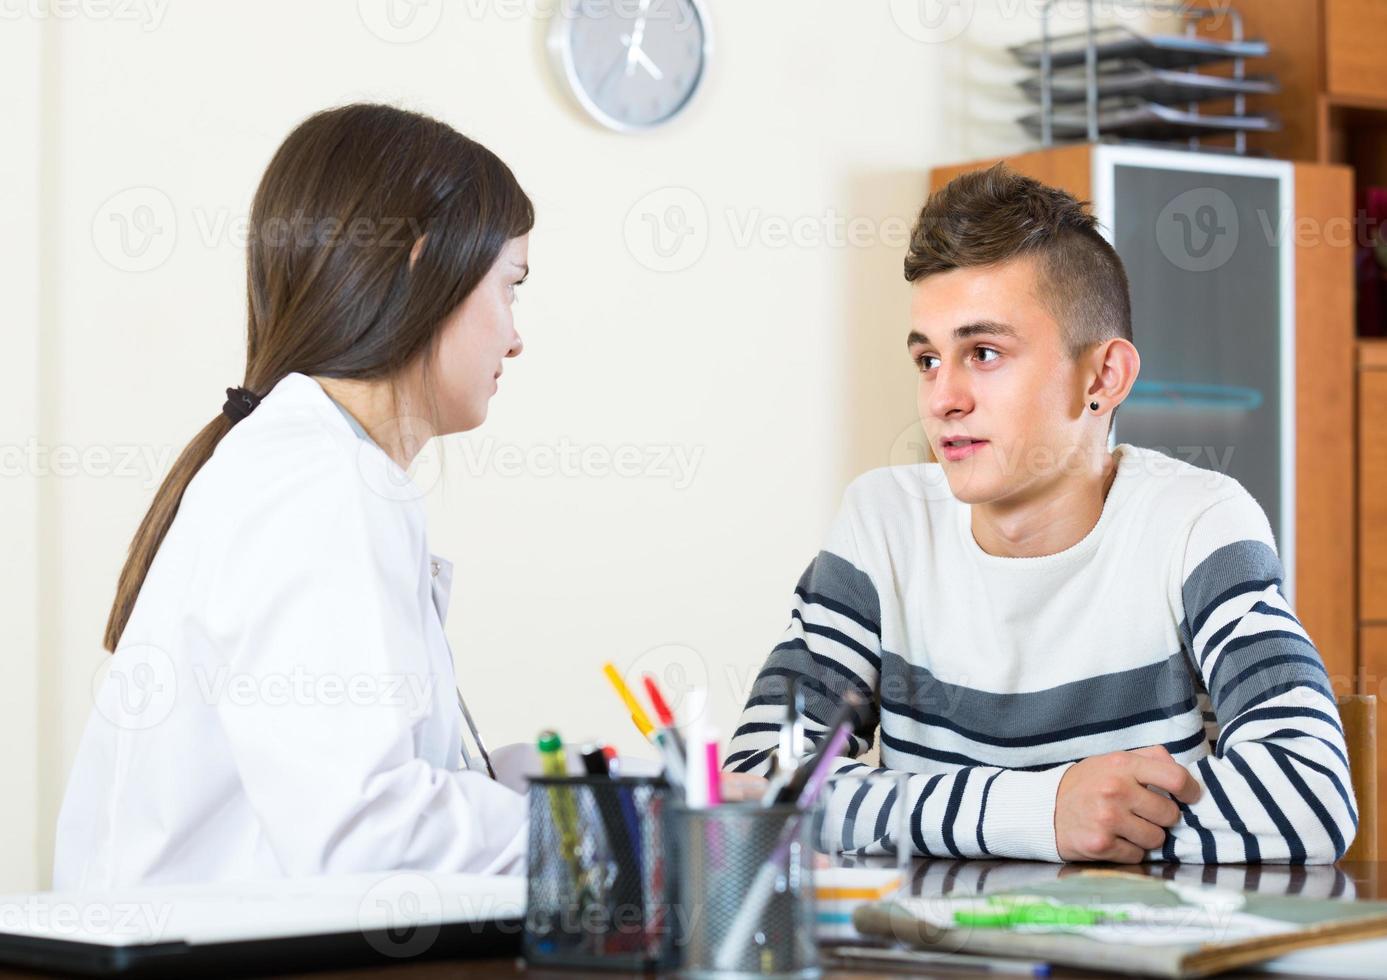 adolescente e médico na mesa na clínica foto